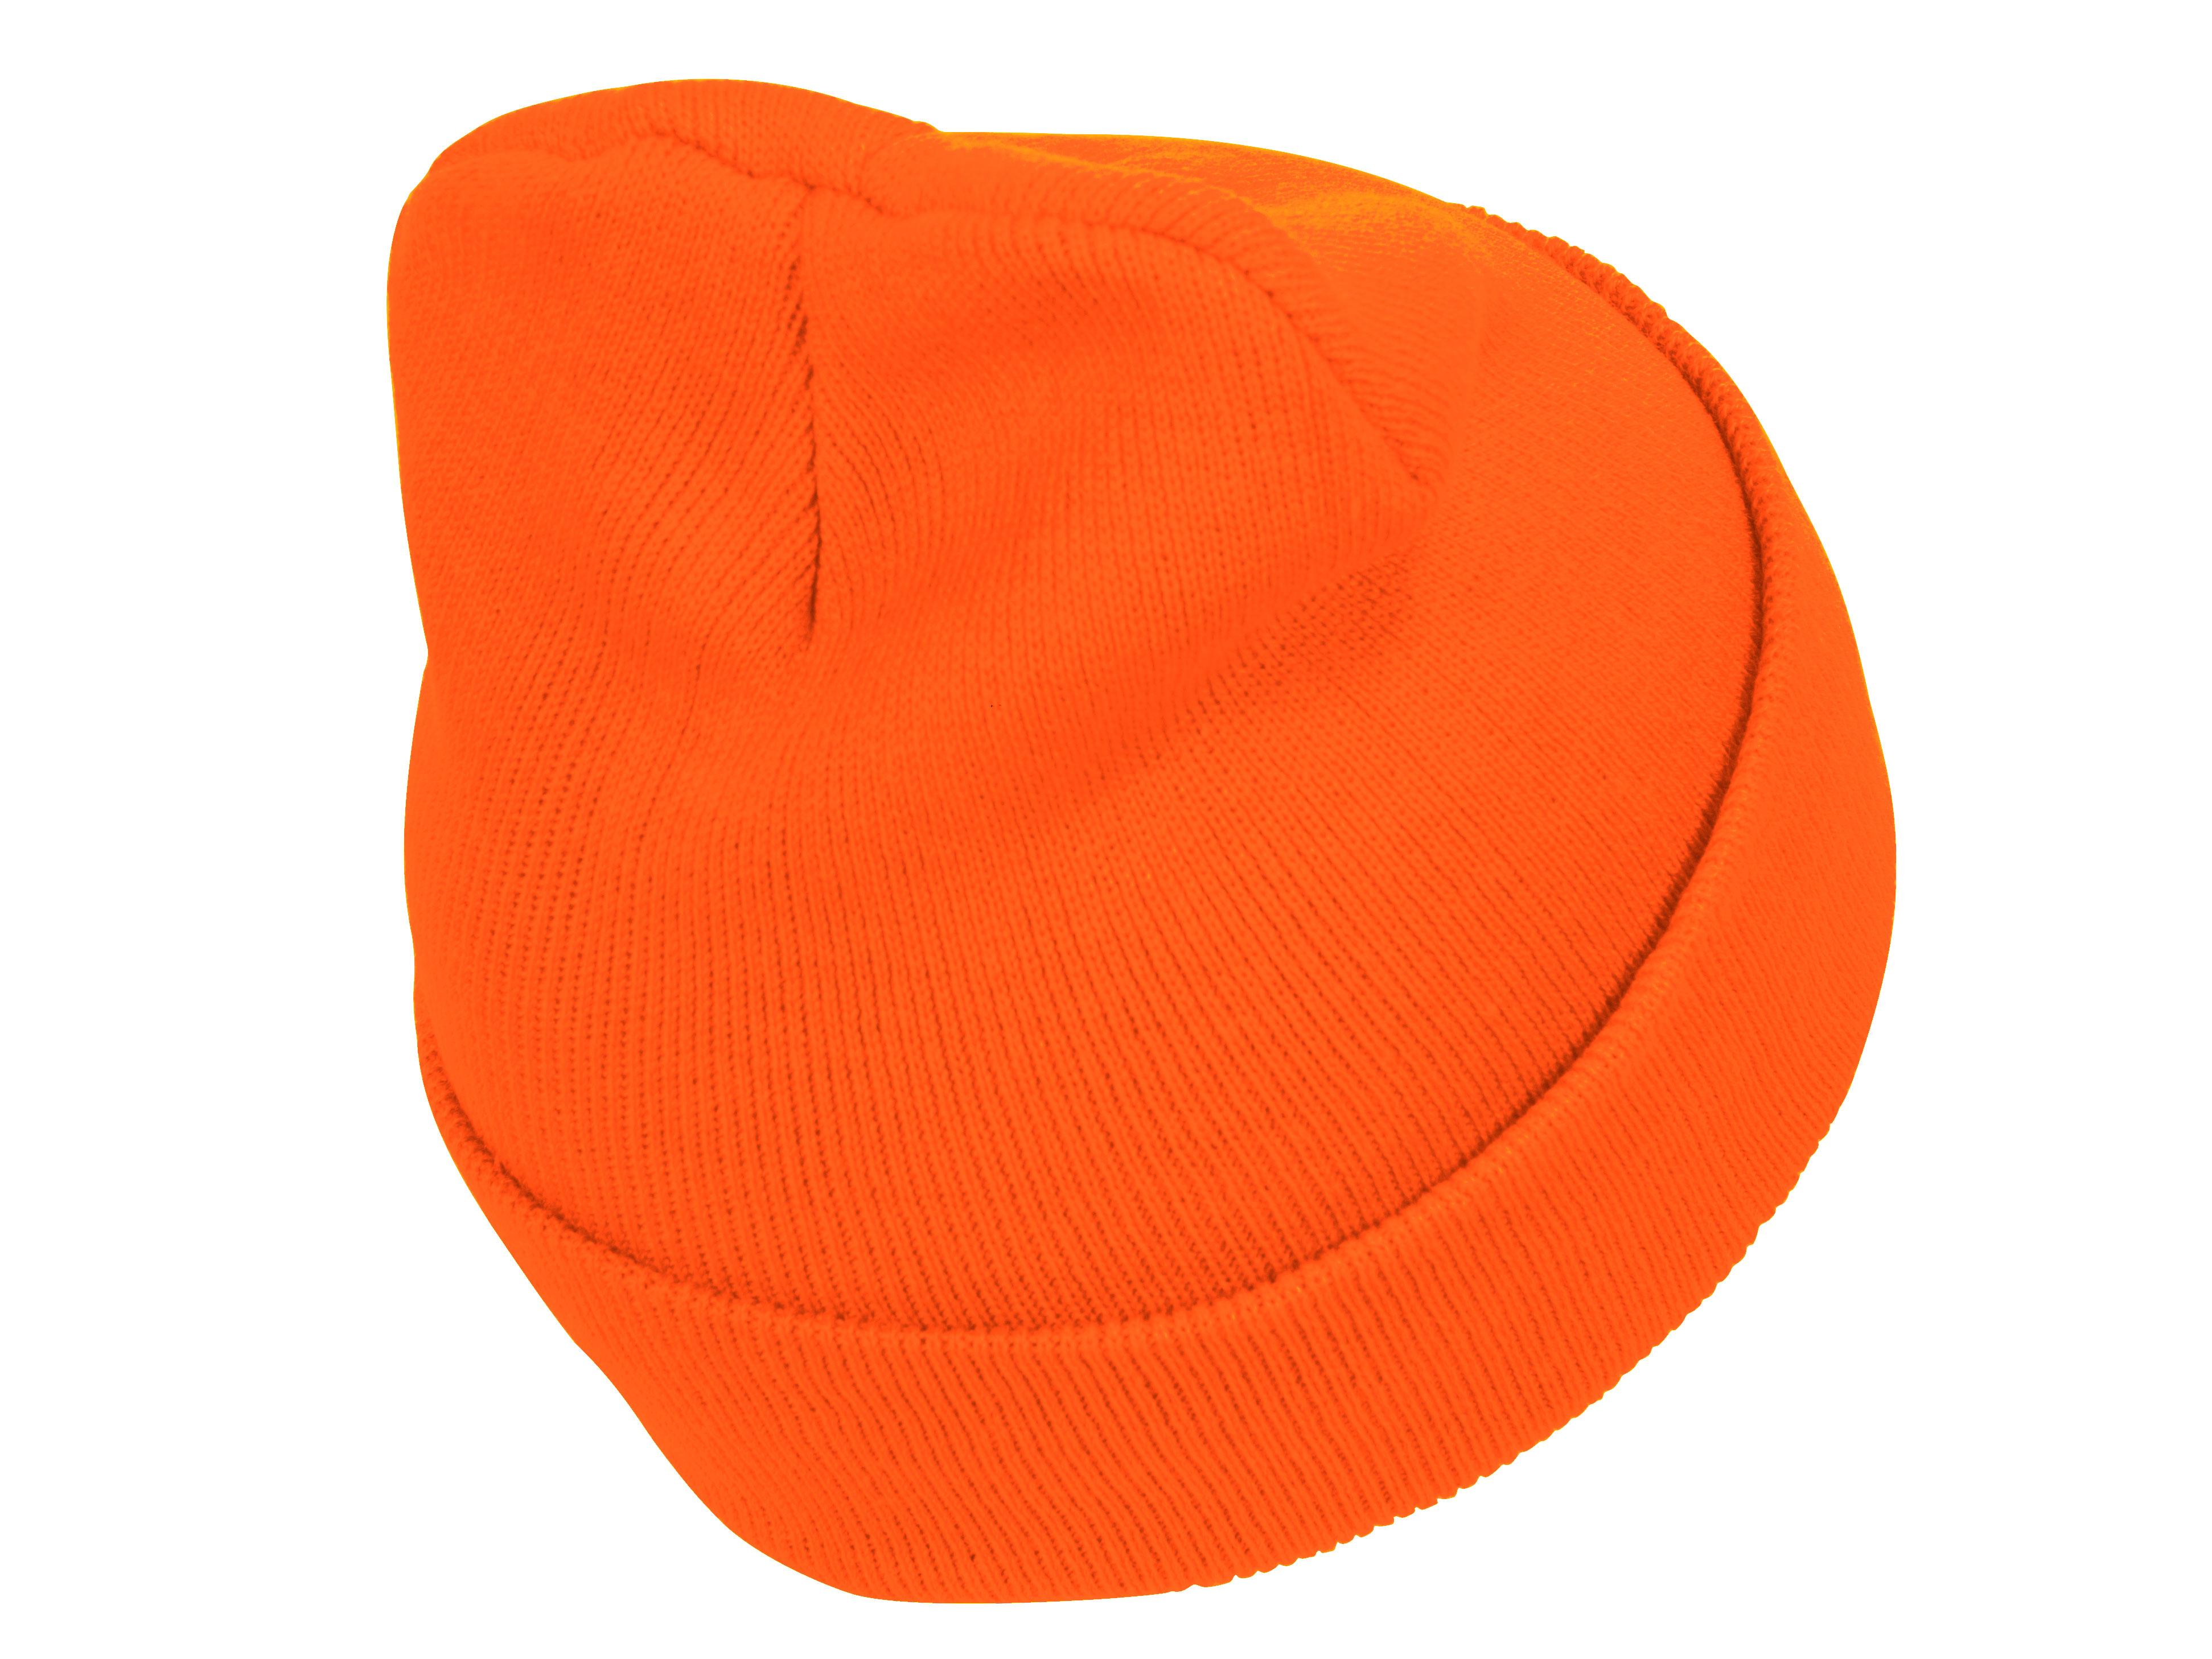 thumbnail 66 - Top Headwear Solid Winter Long Beanie - 12 Piece Wholesale